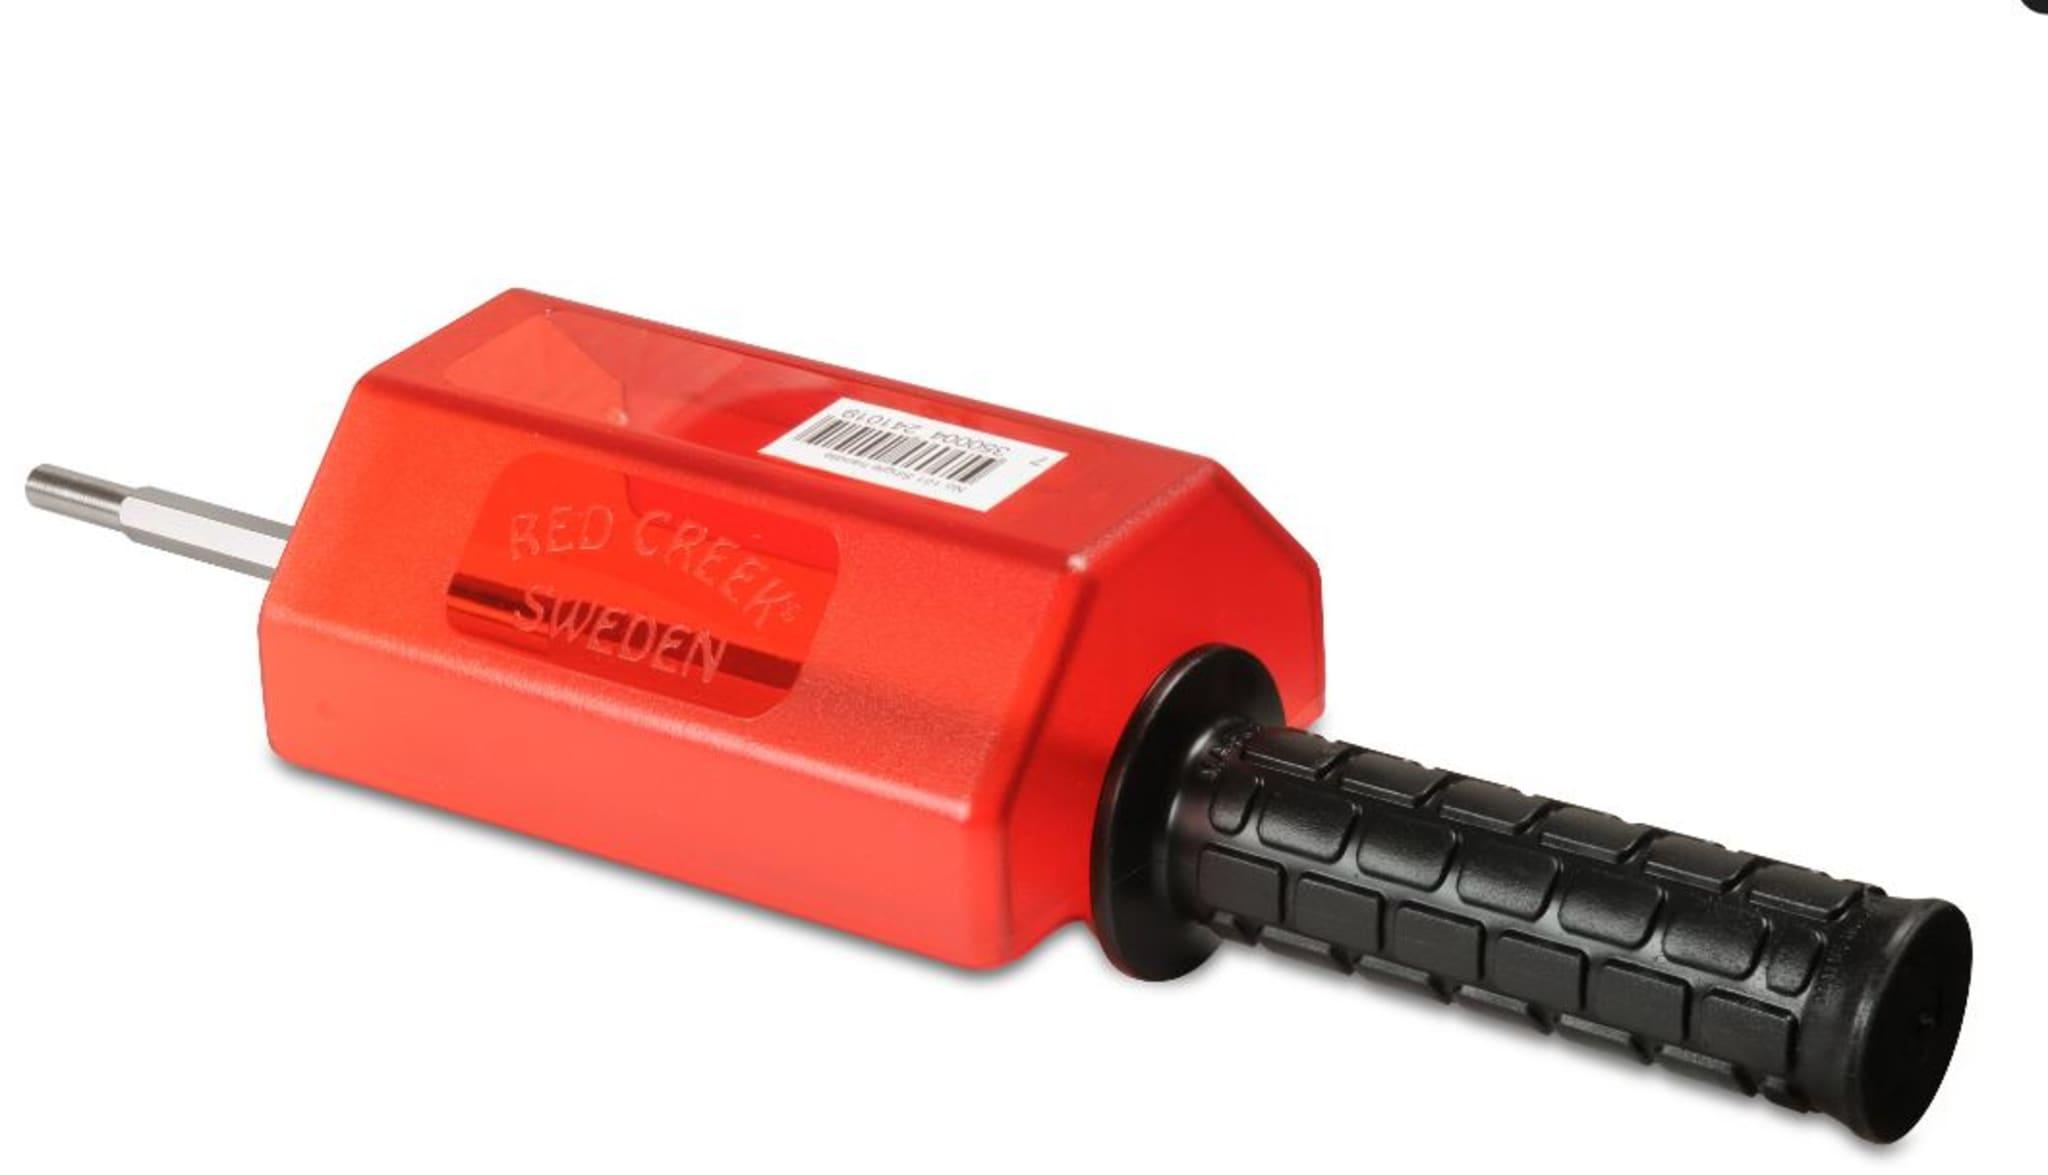 Håndtak med aksling for bruk med 200mm rotorbørster fra Red Creek